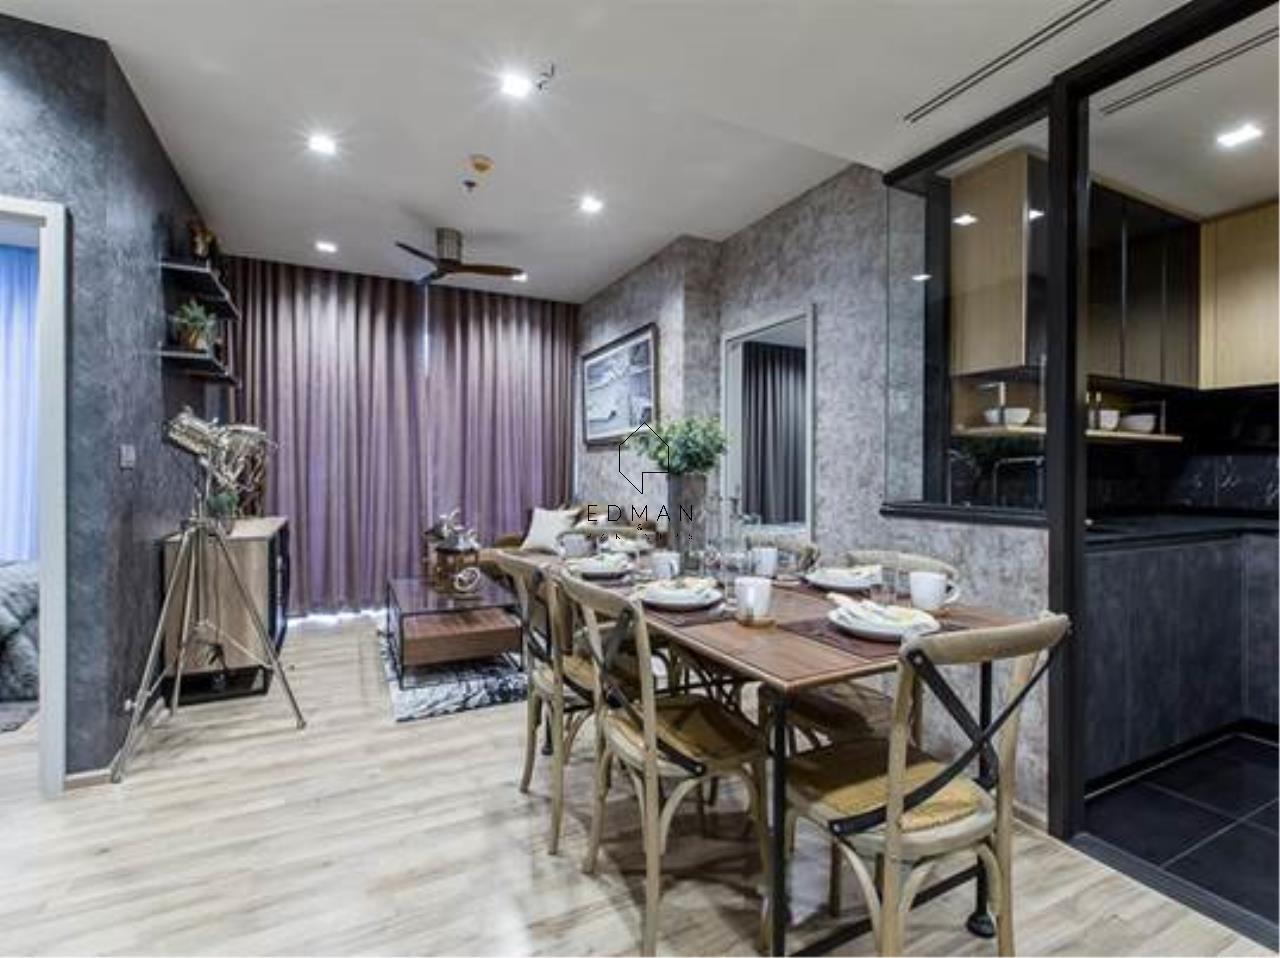 Edman & Partners Co.,Ltd. Agency's The Line Jatujak-Mochit   3  bed   for  rent 2